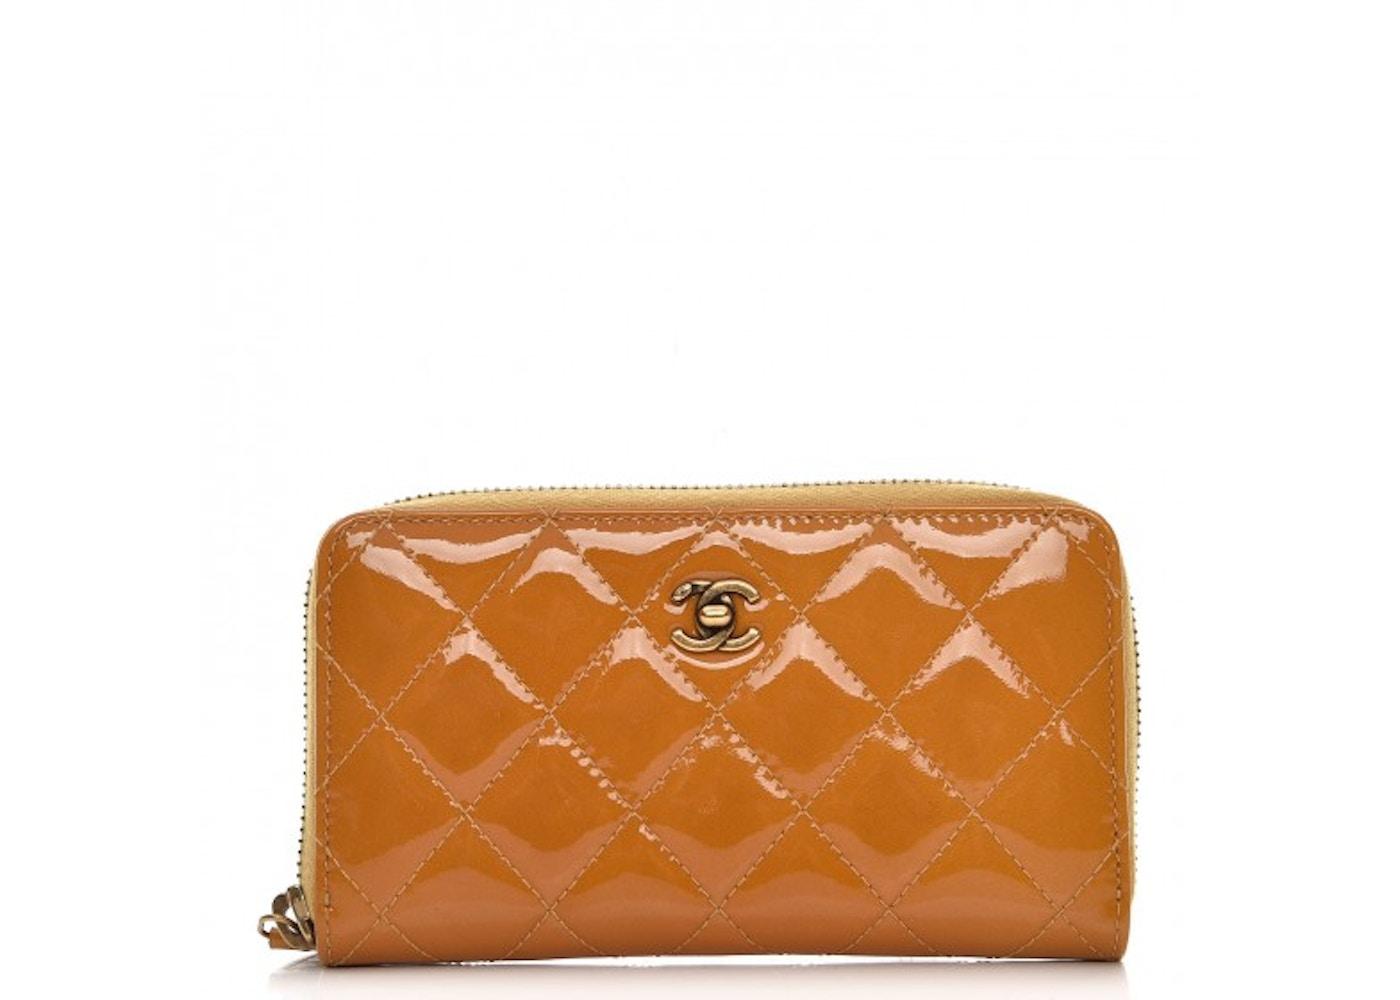 Chanel Zip Around Wallet Quilted Diamond Small Mustard